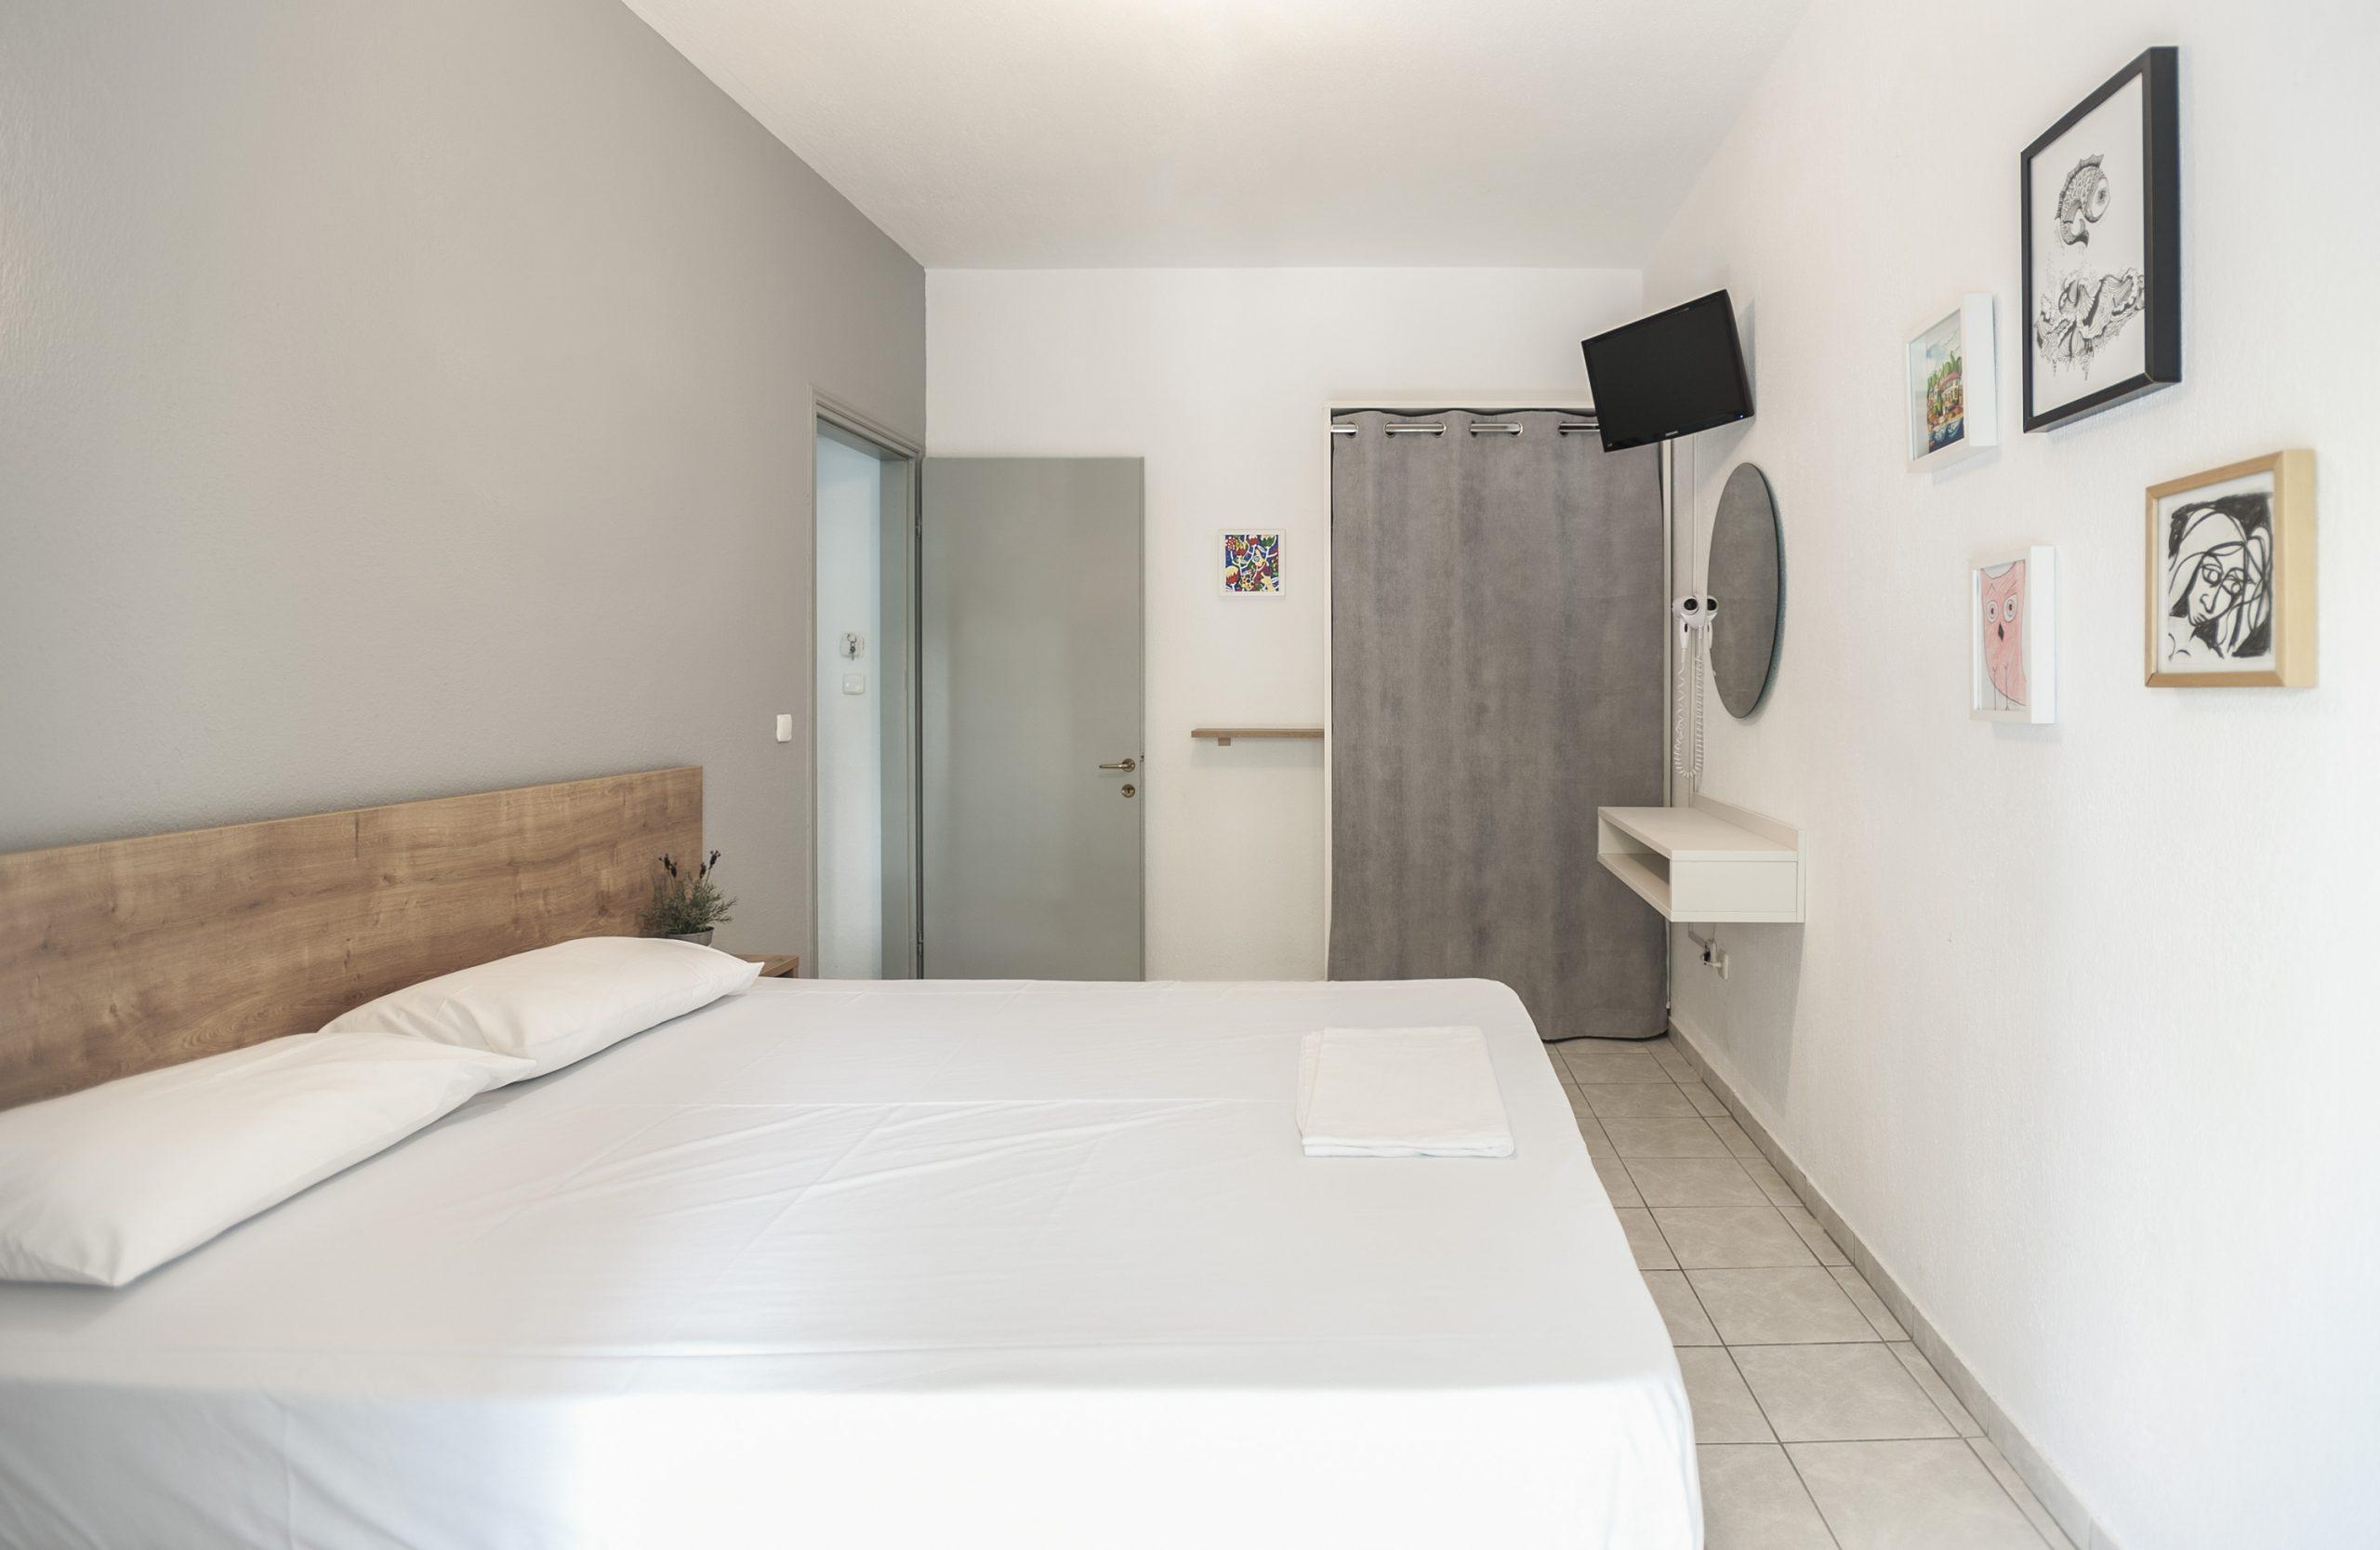 Afkos_rooms_020